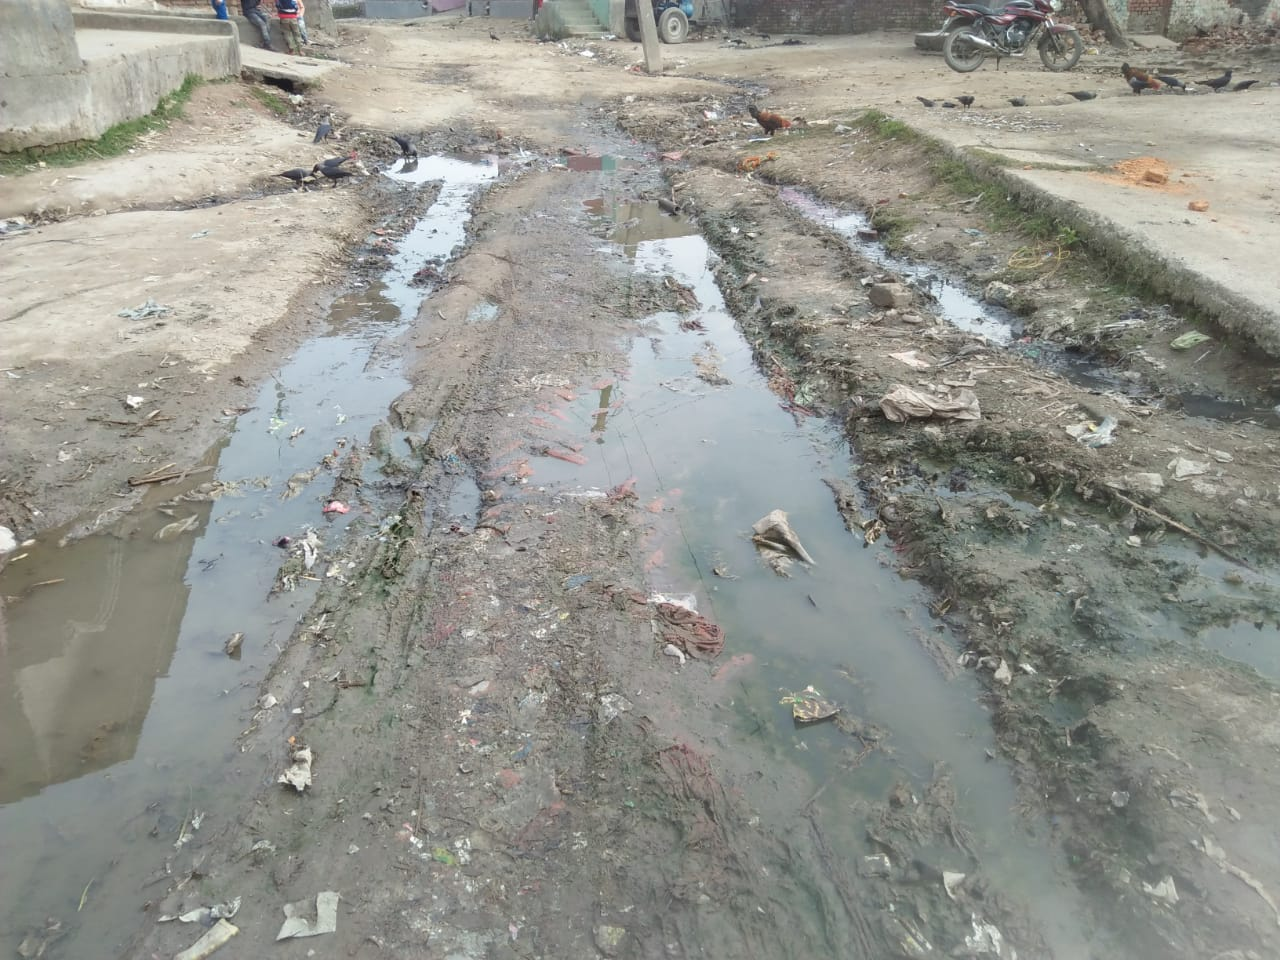 हिंदी समाचार |गड्ढा युक्त सड़क को गड्ढा...